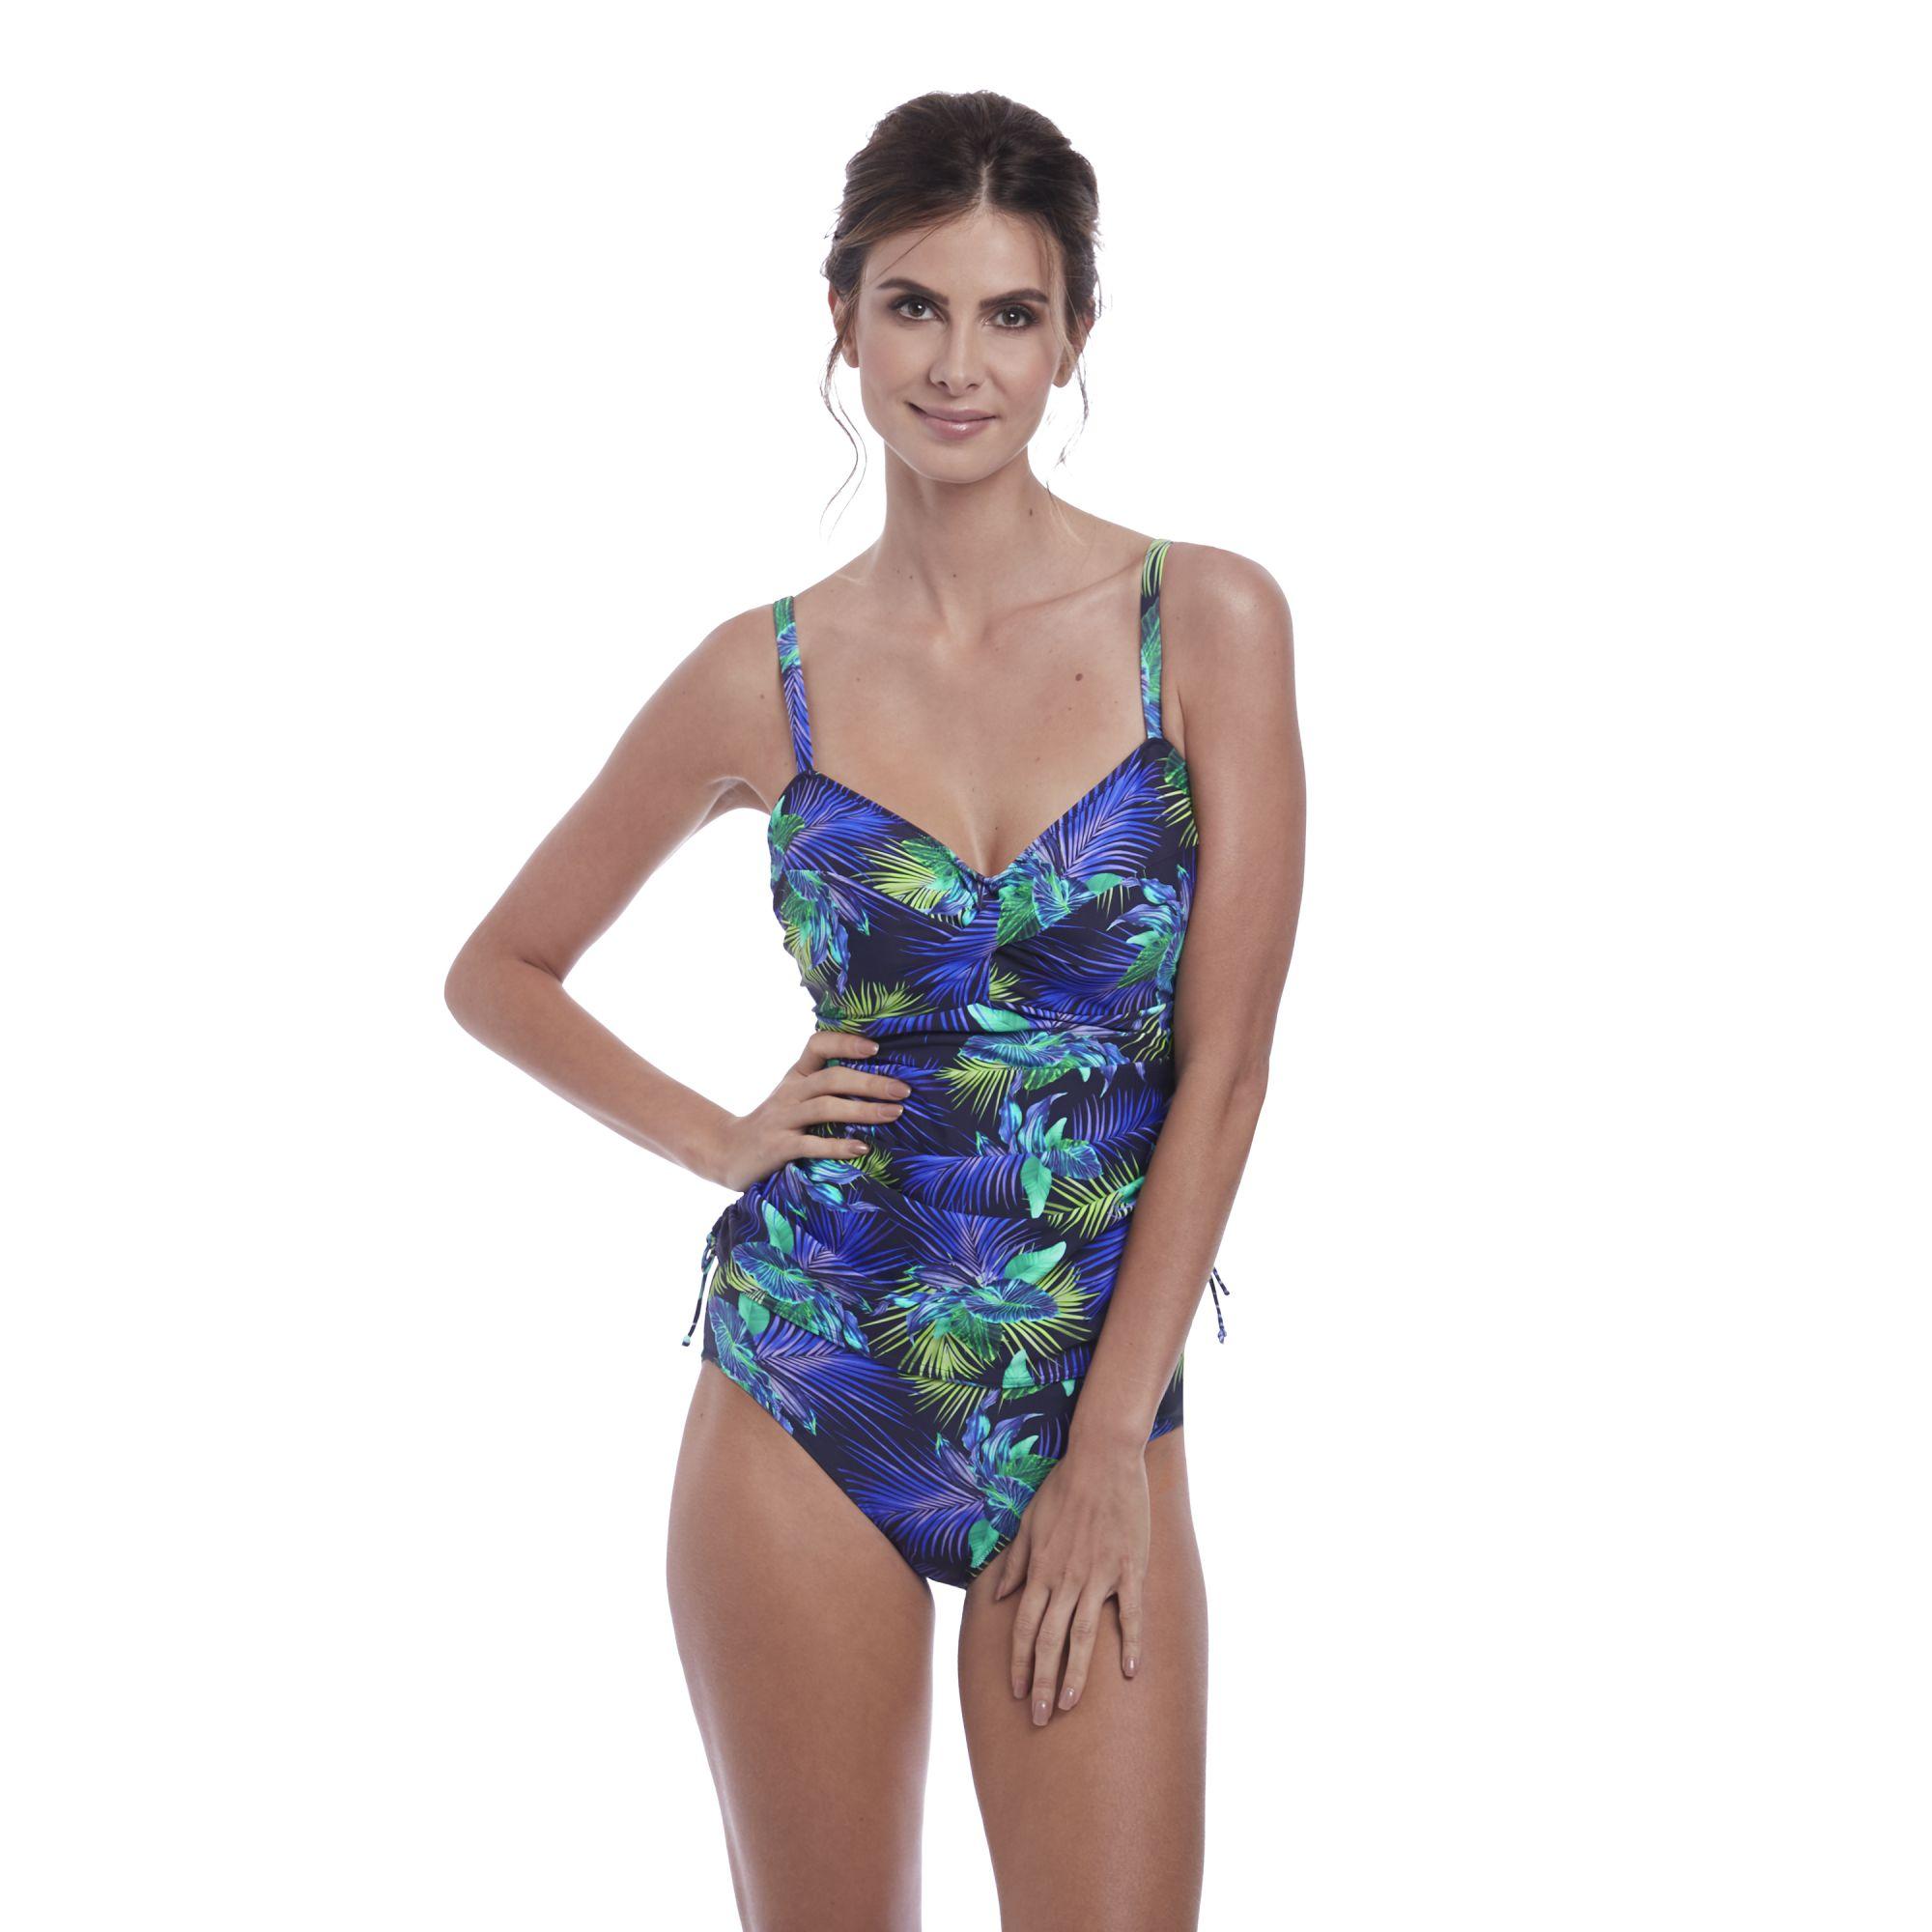 Fantasie Coconut Grove swimsuit